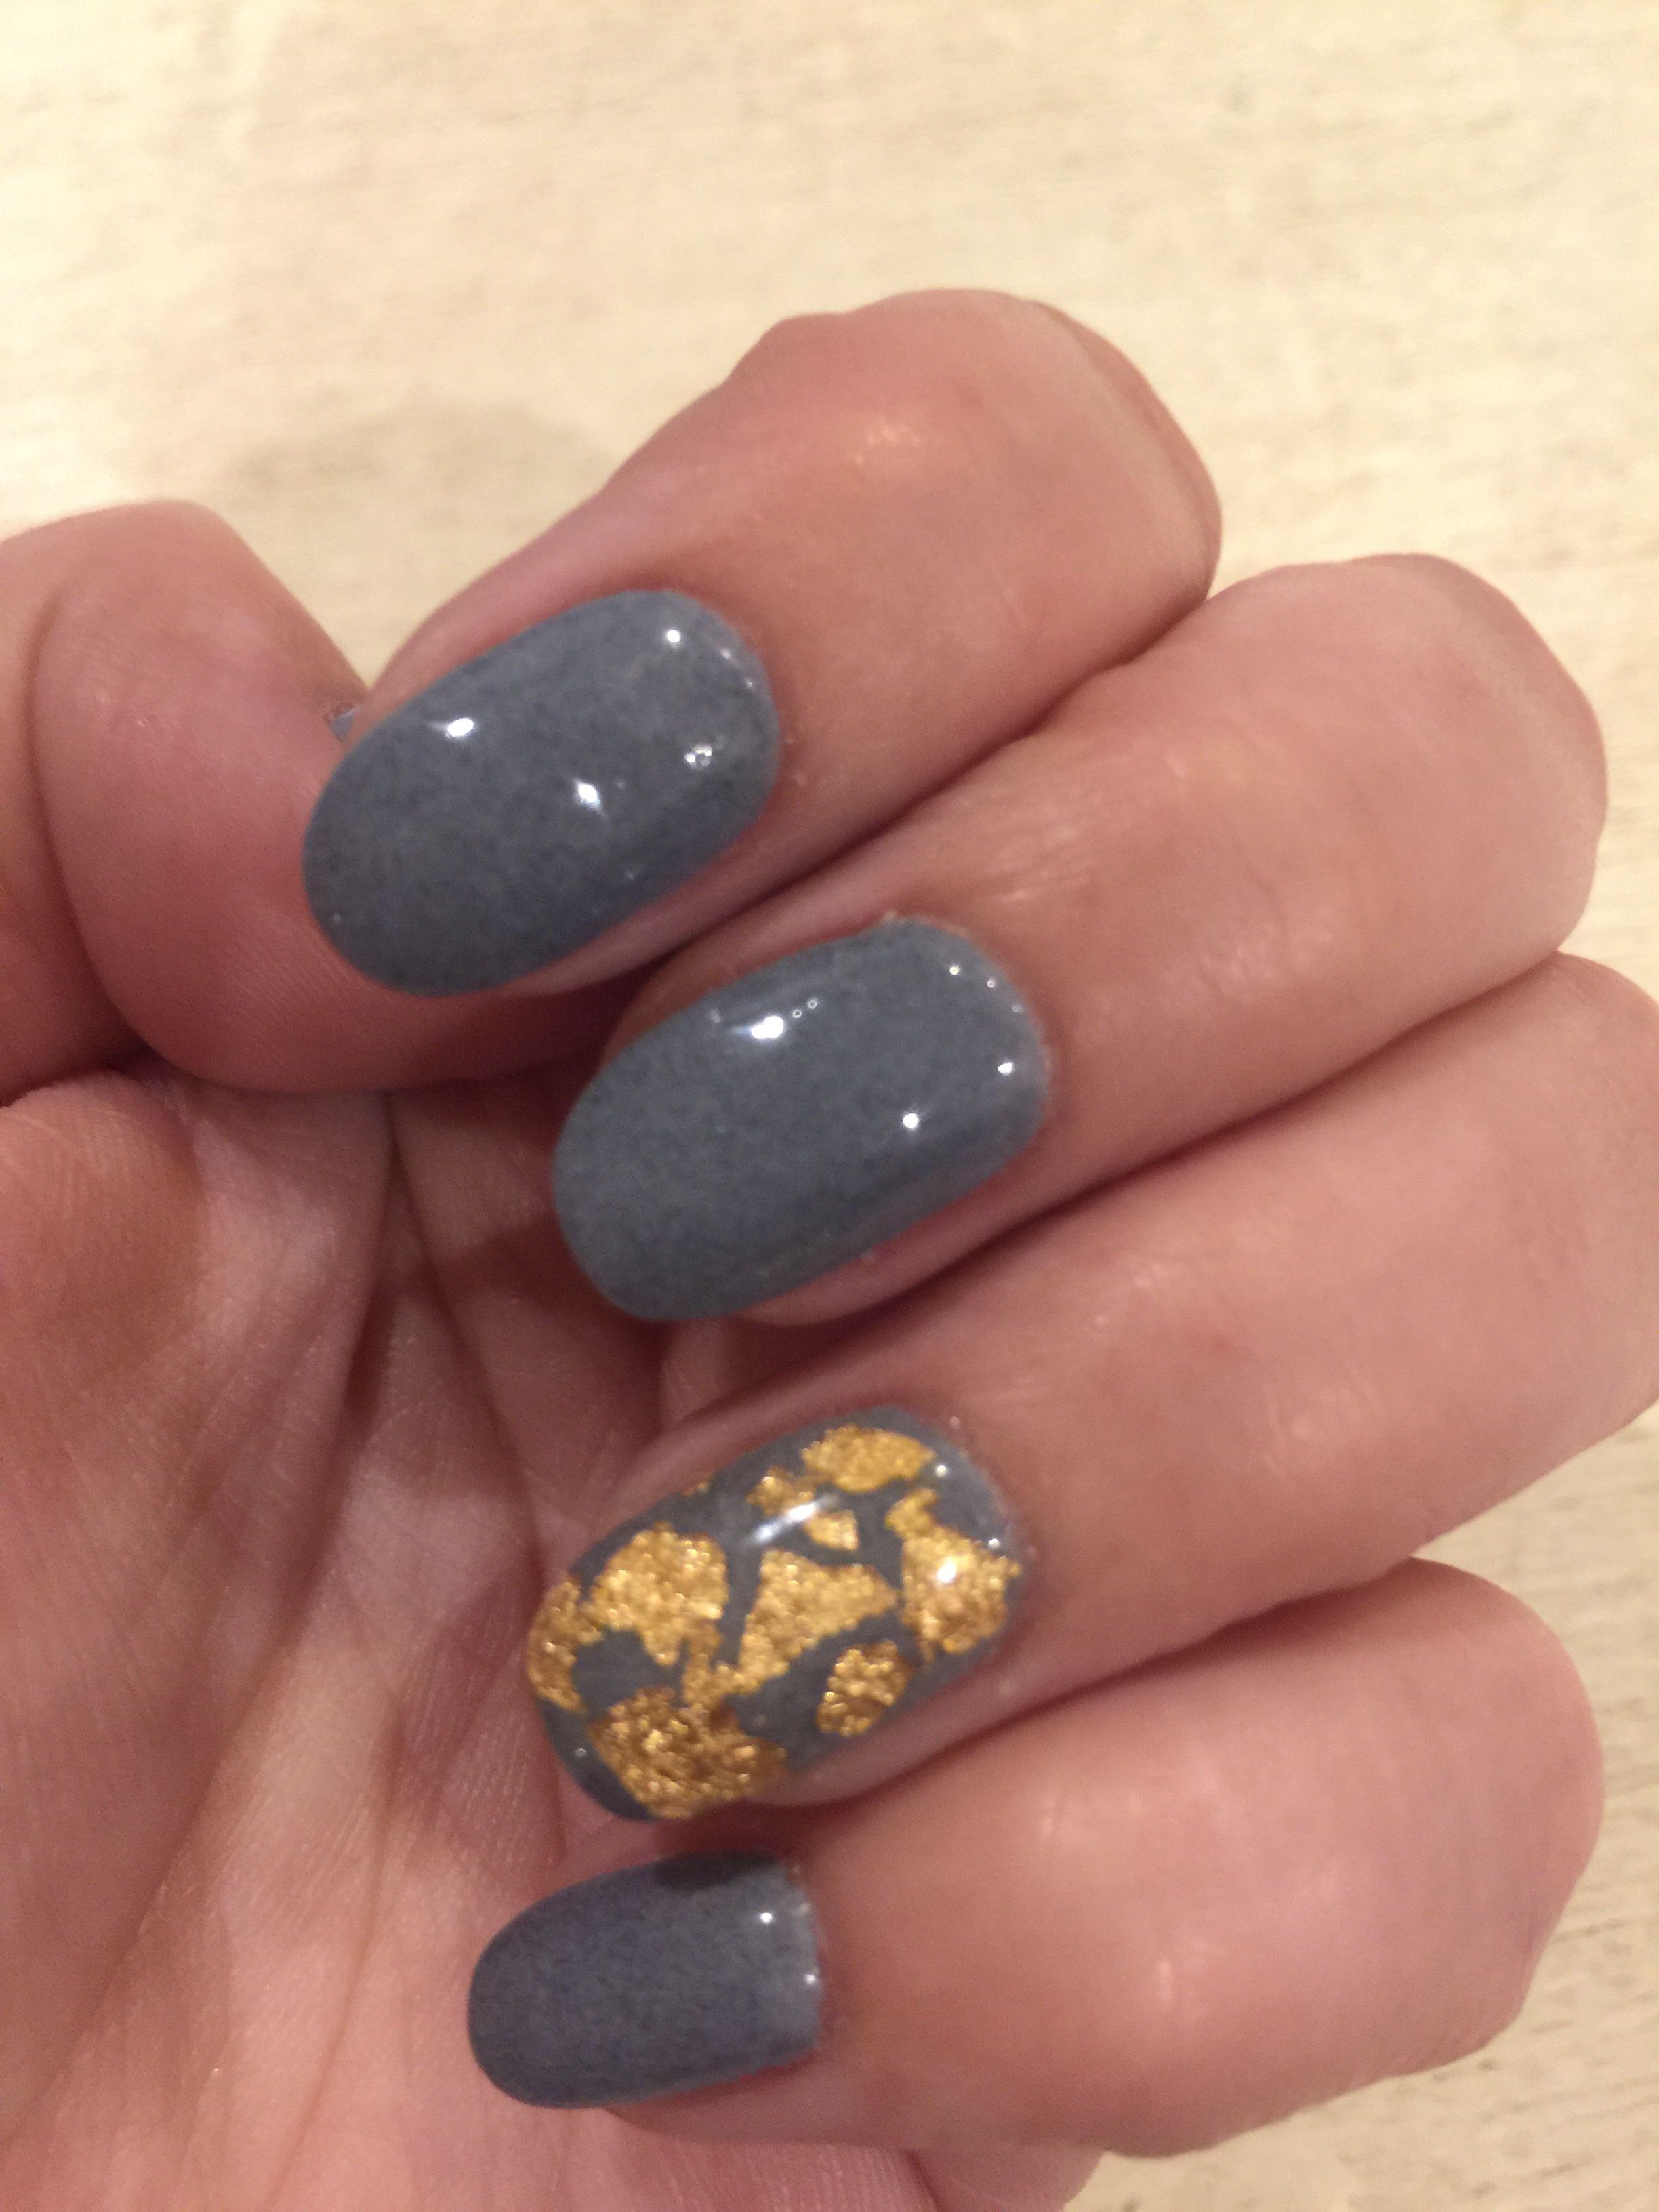 Kiara Sky Dip Powder With Gold Foil Powder Nails Dip Powder Nails Winter Nails Acrylic